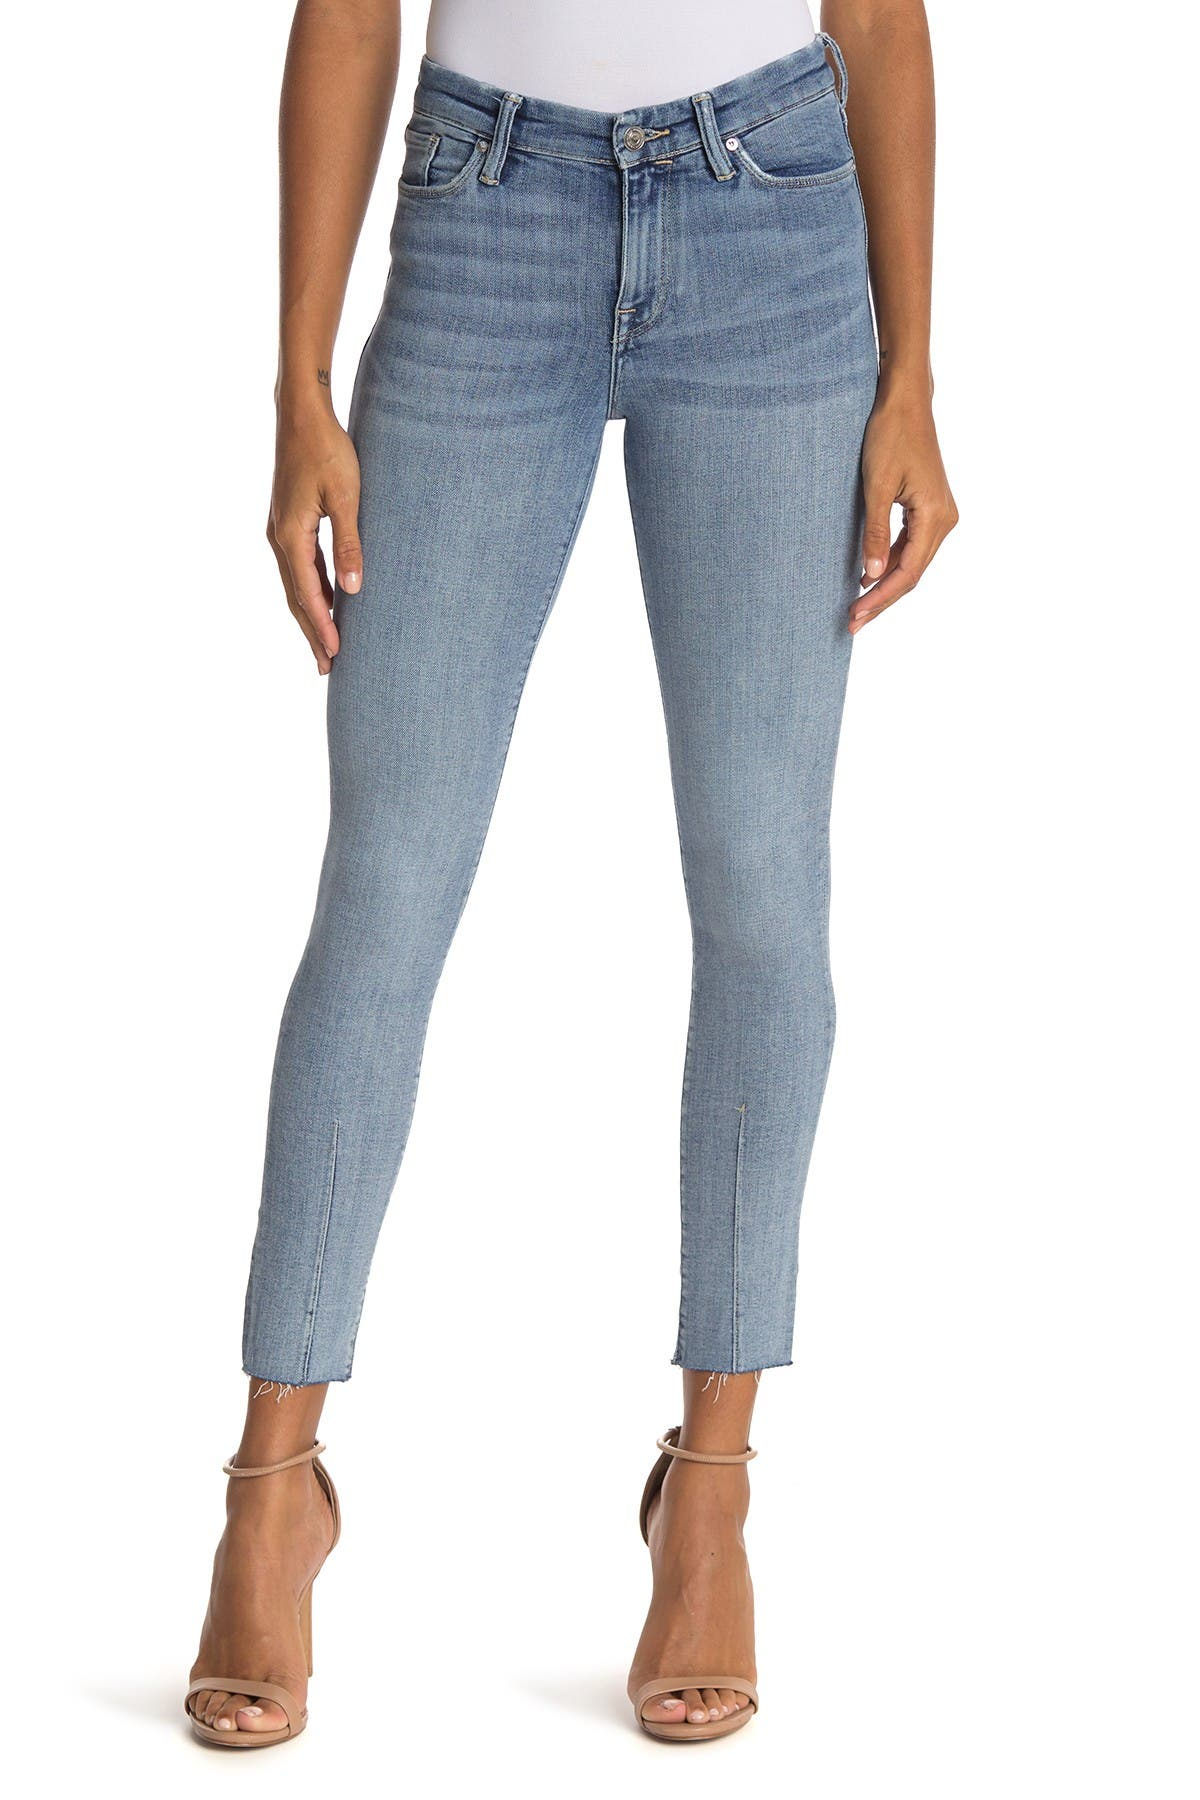 Image of ALLSAINTS Grace Dart Ankle Crop Skinny Jeans